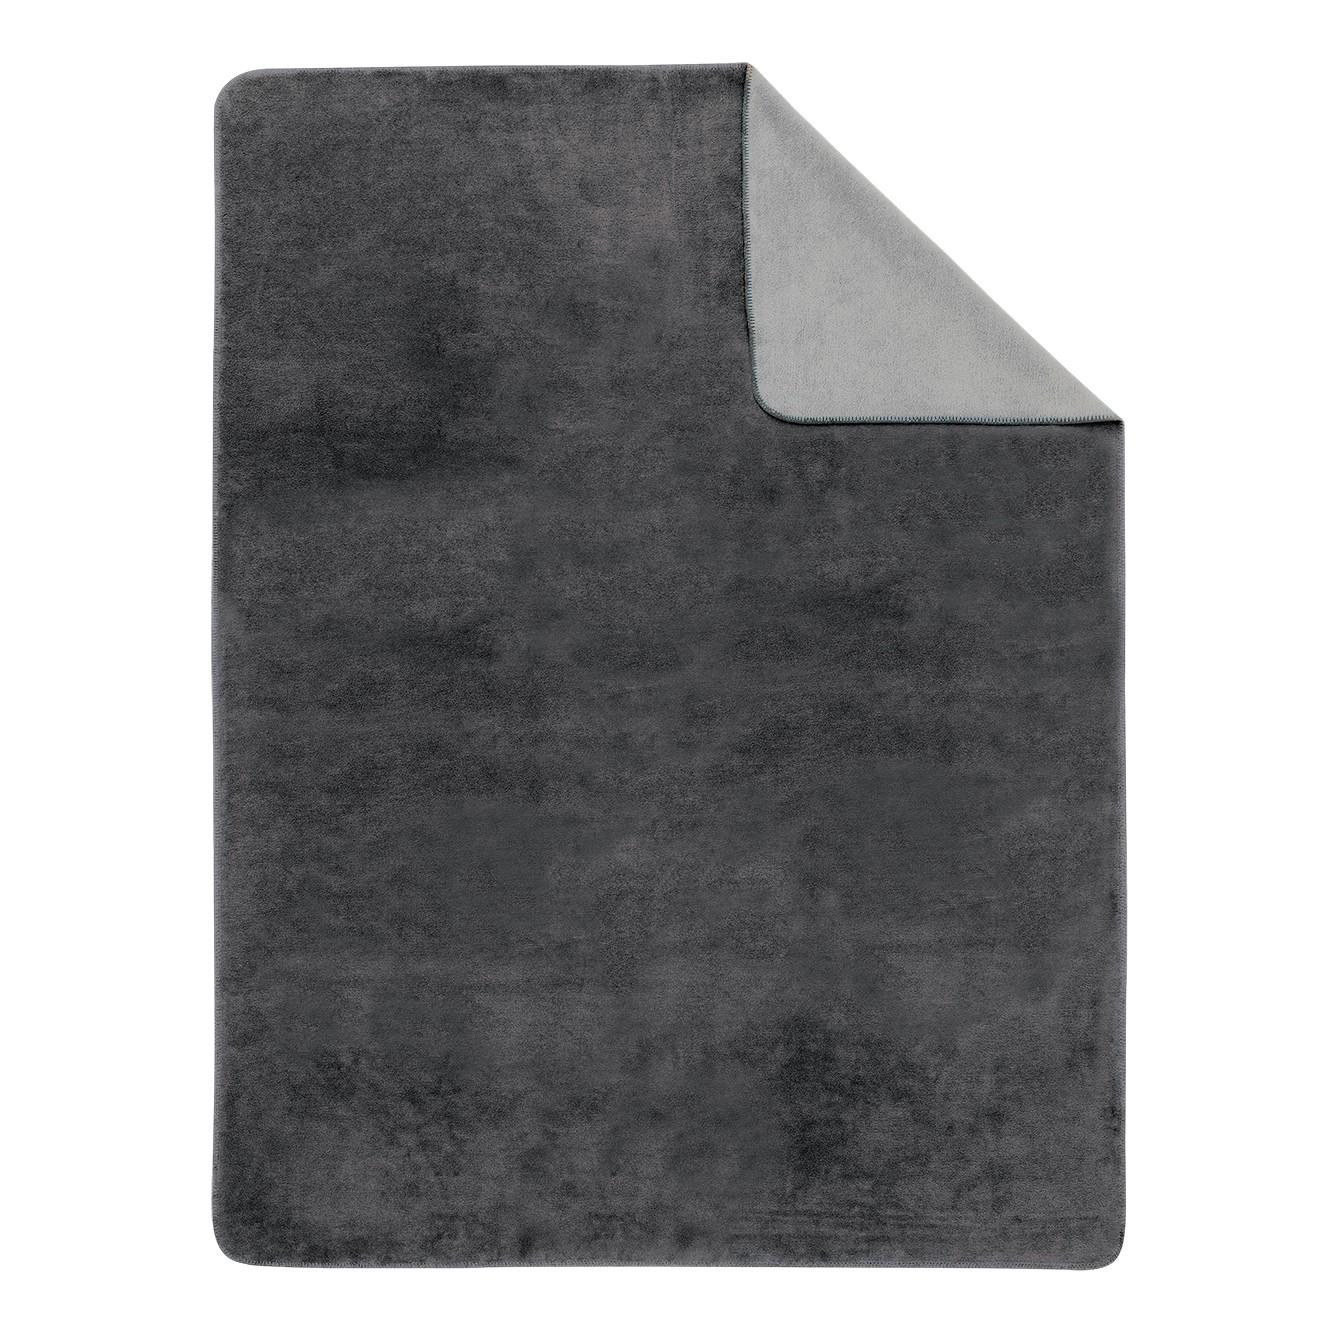 Effen deken Sorrento Doubleface - Grijs/lichtgrijs - 220x240cm, Ibena